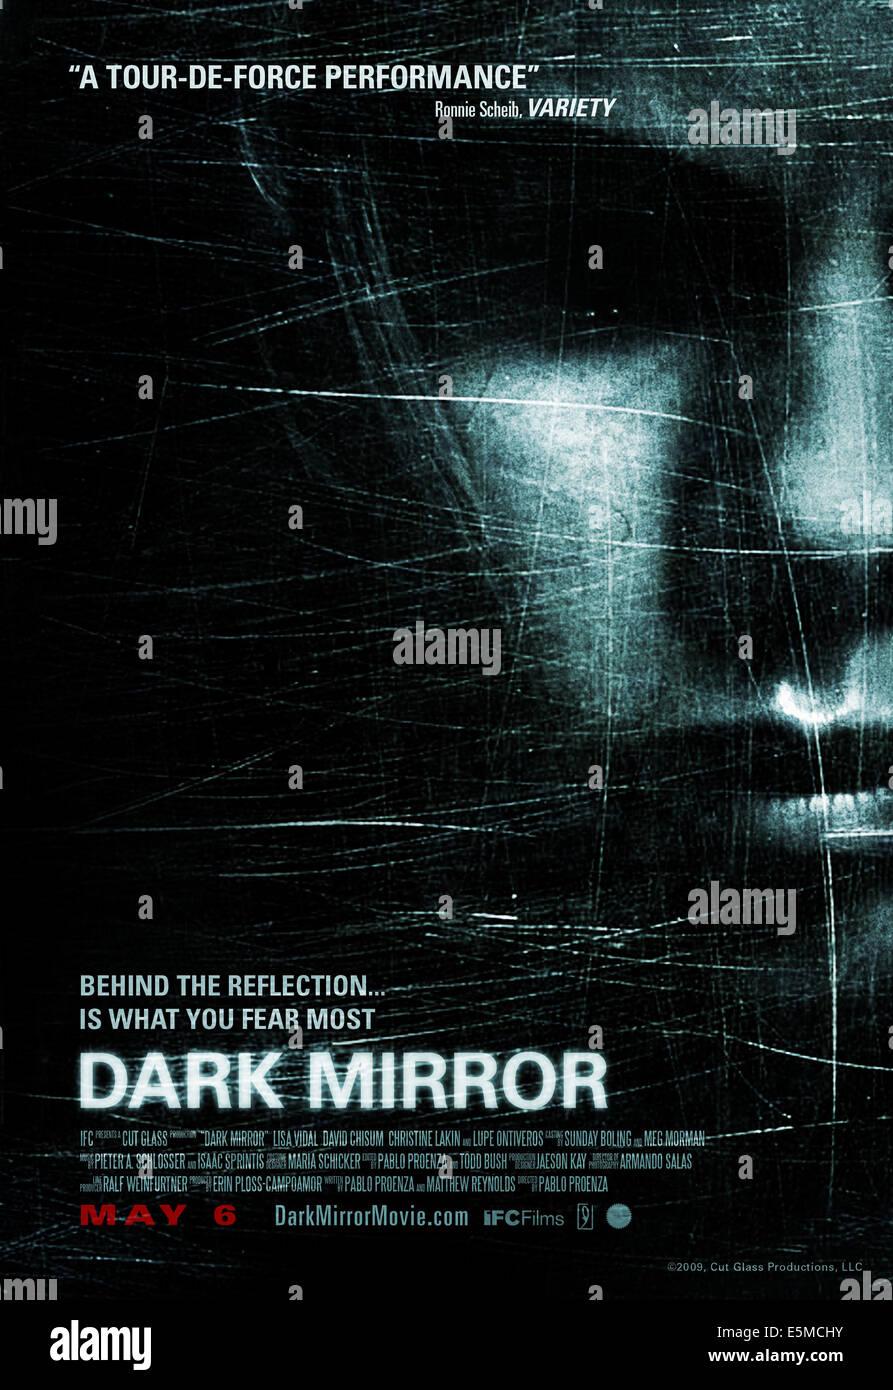 DARK MIRROR, US poster art, 2007. ©IFC Films/Courtesy Everett Collection - Stock Image